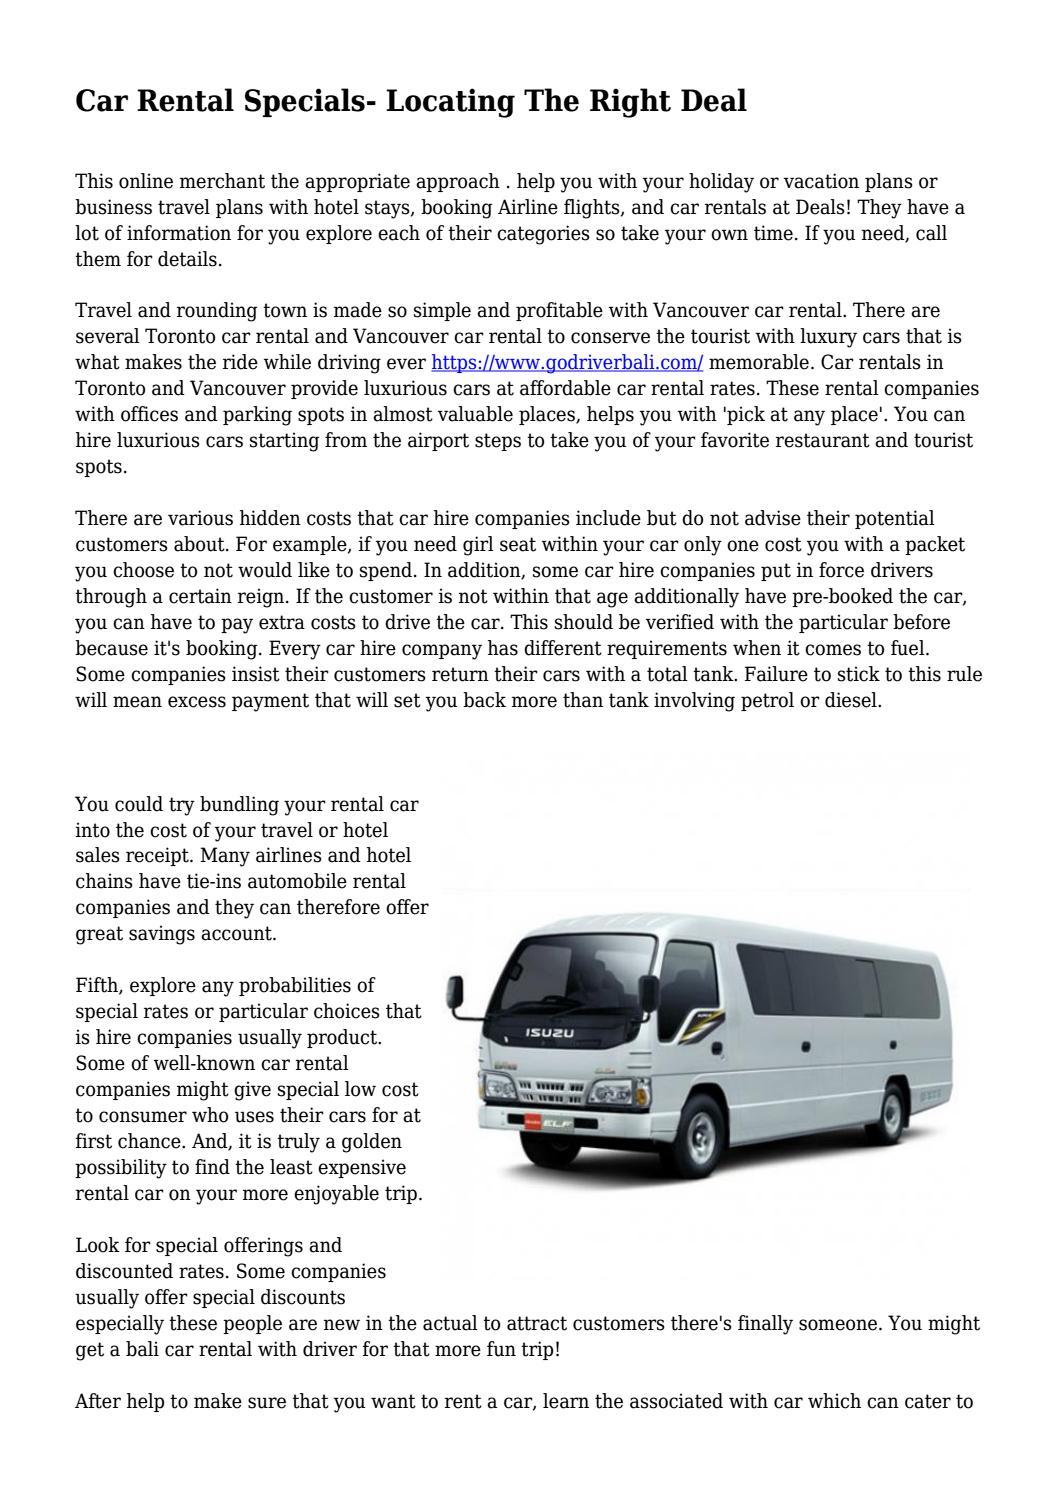 5f9b9ed779 Car Rental Specials- Locating The Right Deal by edutechfield - issuu